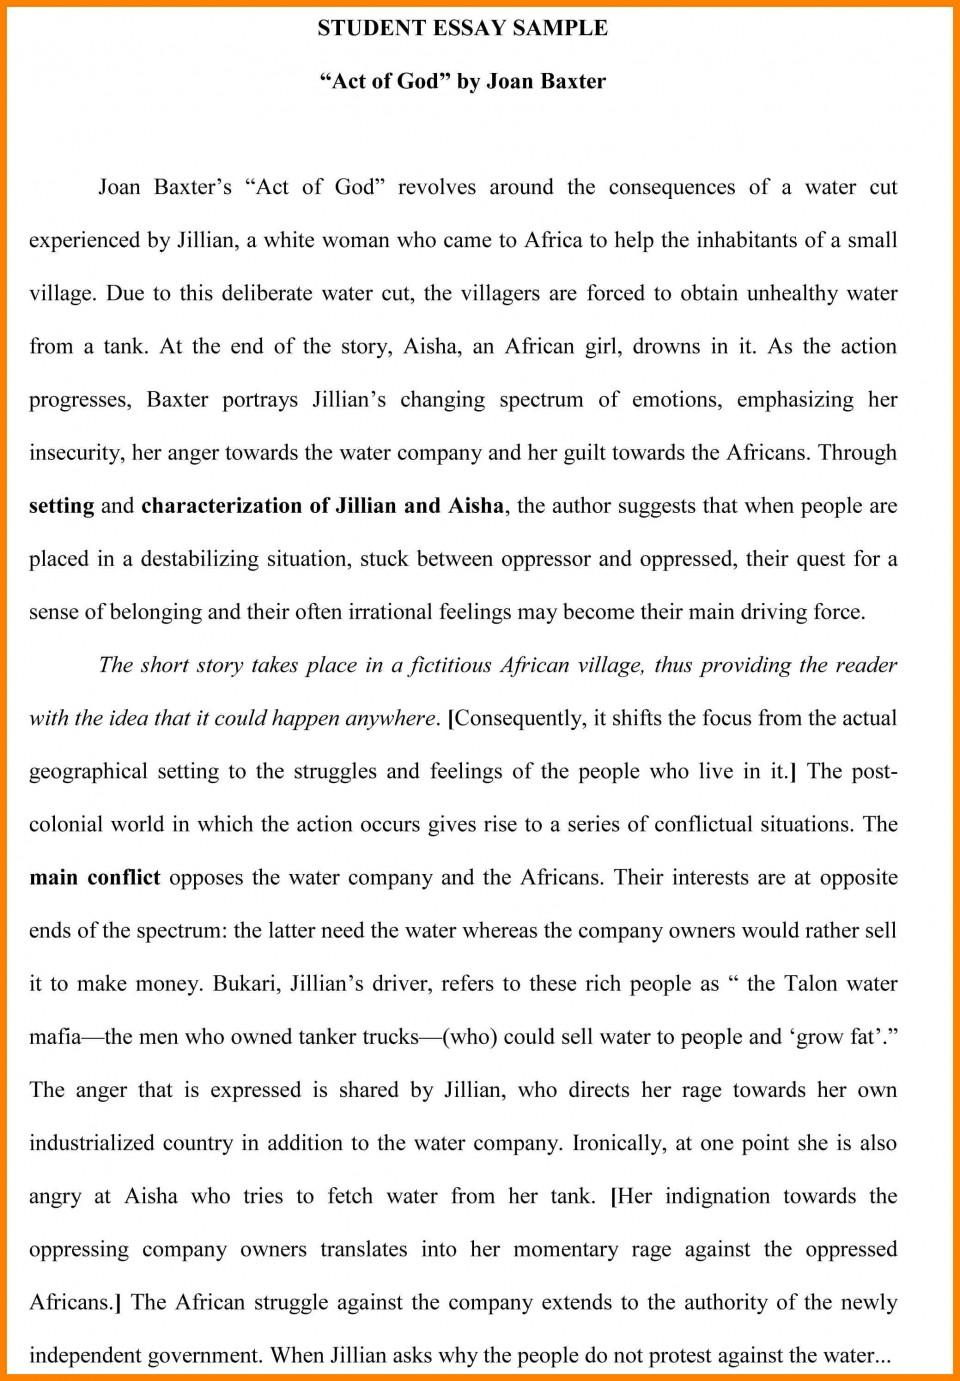 019 Essay Example How To Write Better ~ Thatsnotus